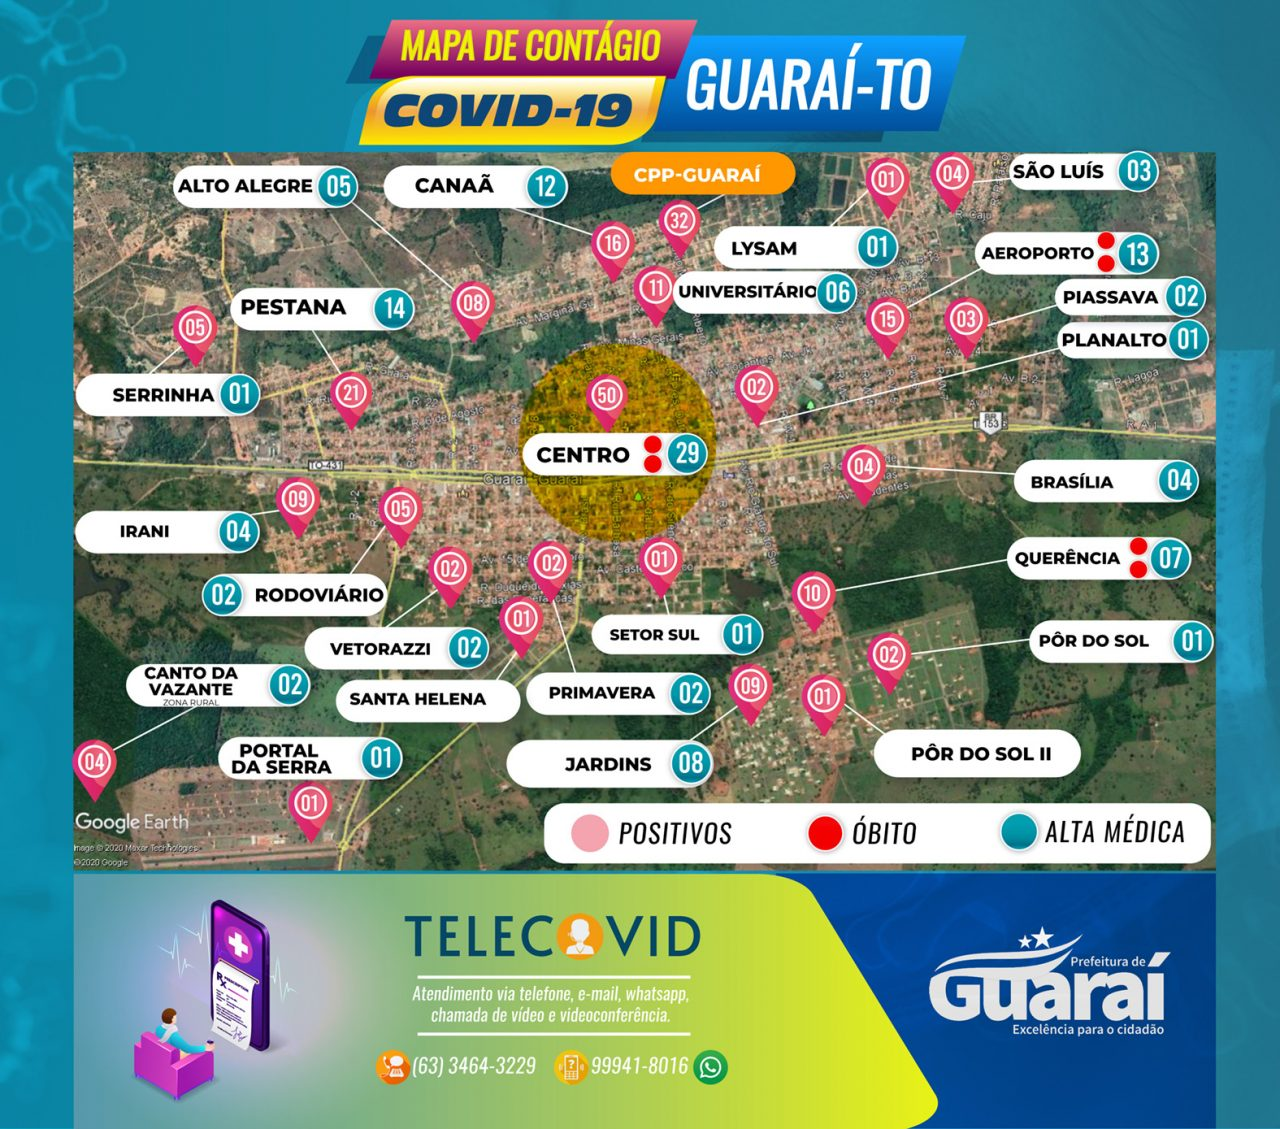 MAPA GUARAI COVID19 1 DE JULHO QUARTA 1280x1129 - Painel Guaraí-TO / Covid-19 / Boletim 01 de Julho (quarta) 16:00